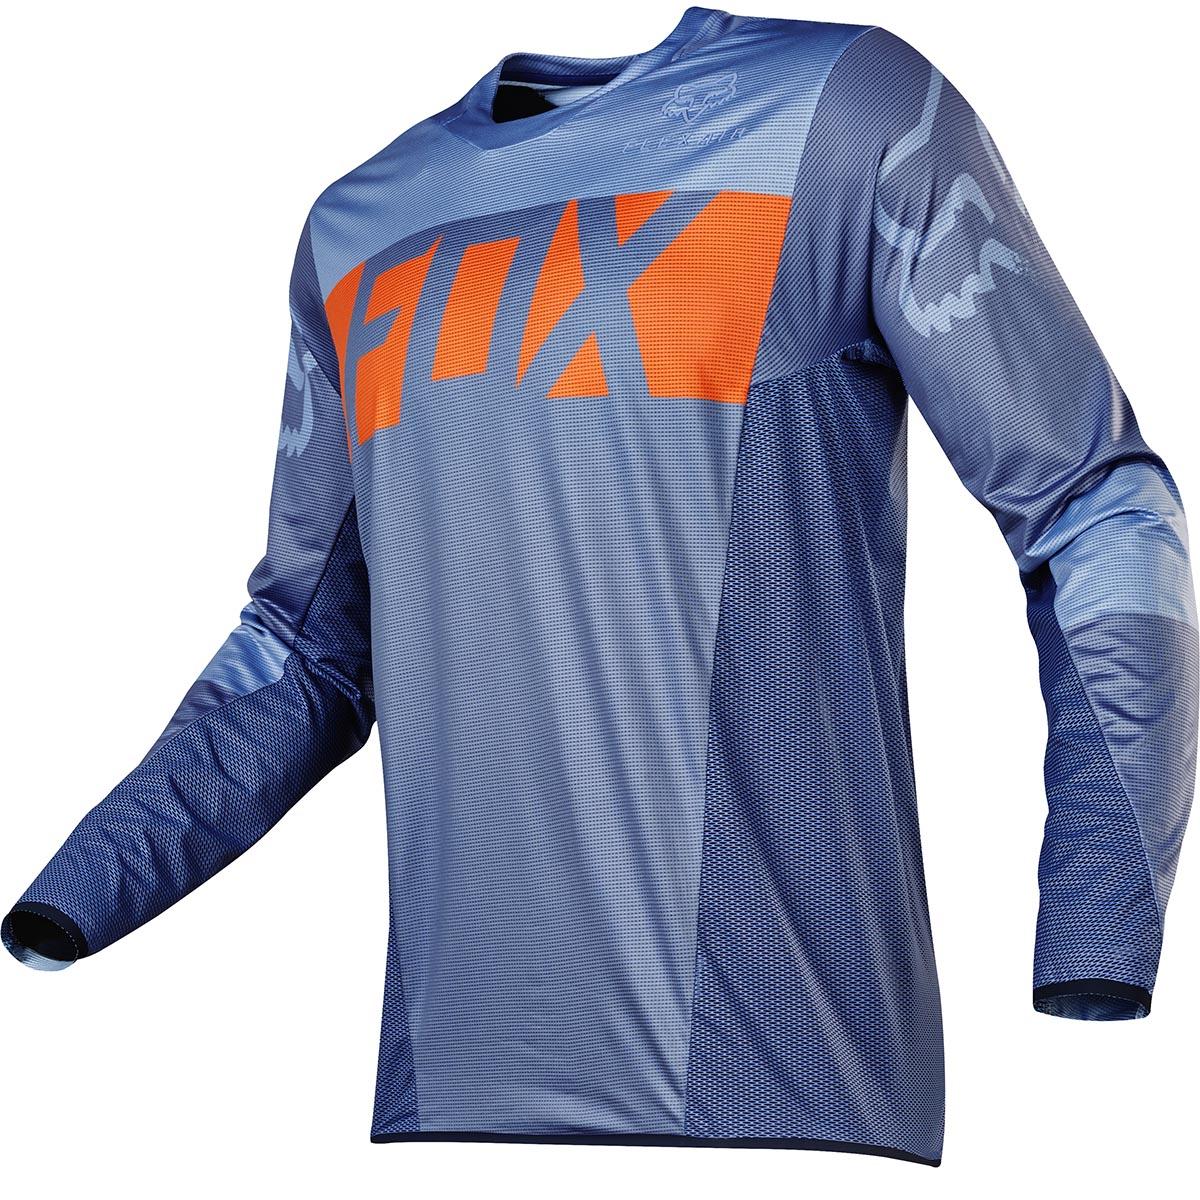 Fox - 2017 Flexair Libra джерси, оранжево-синее